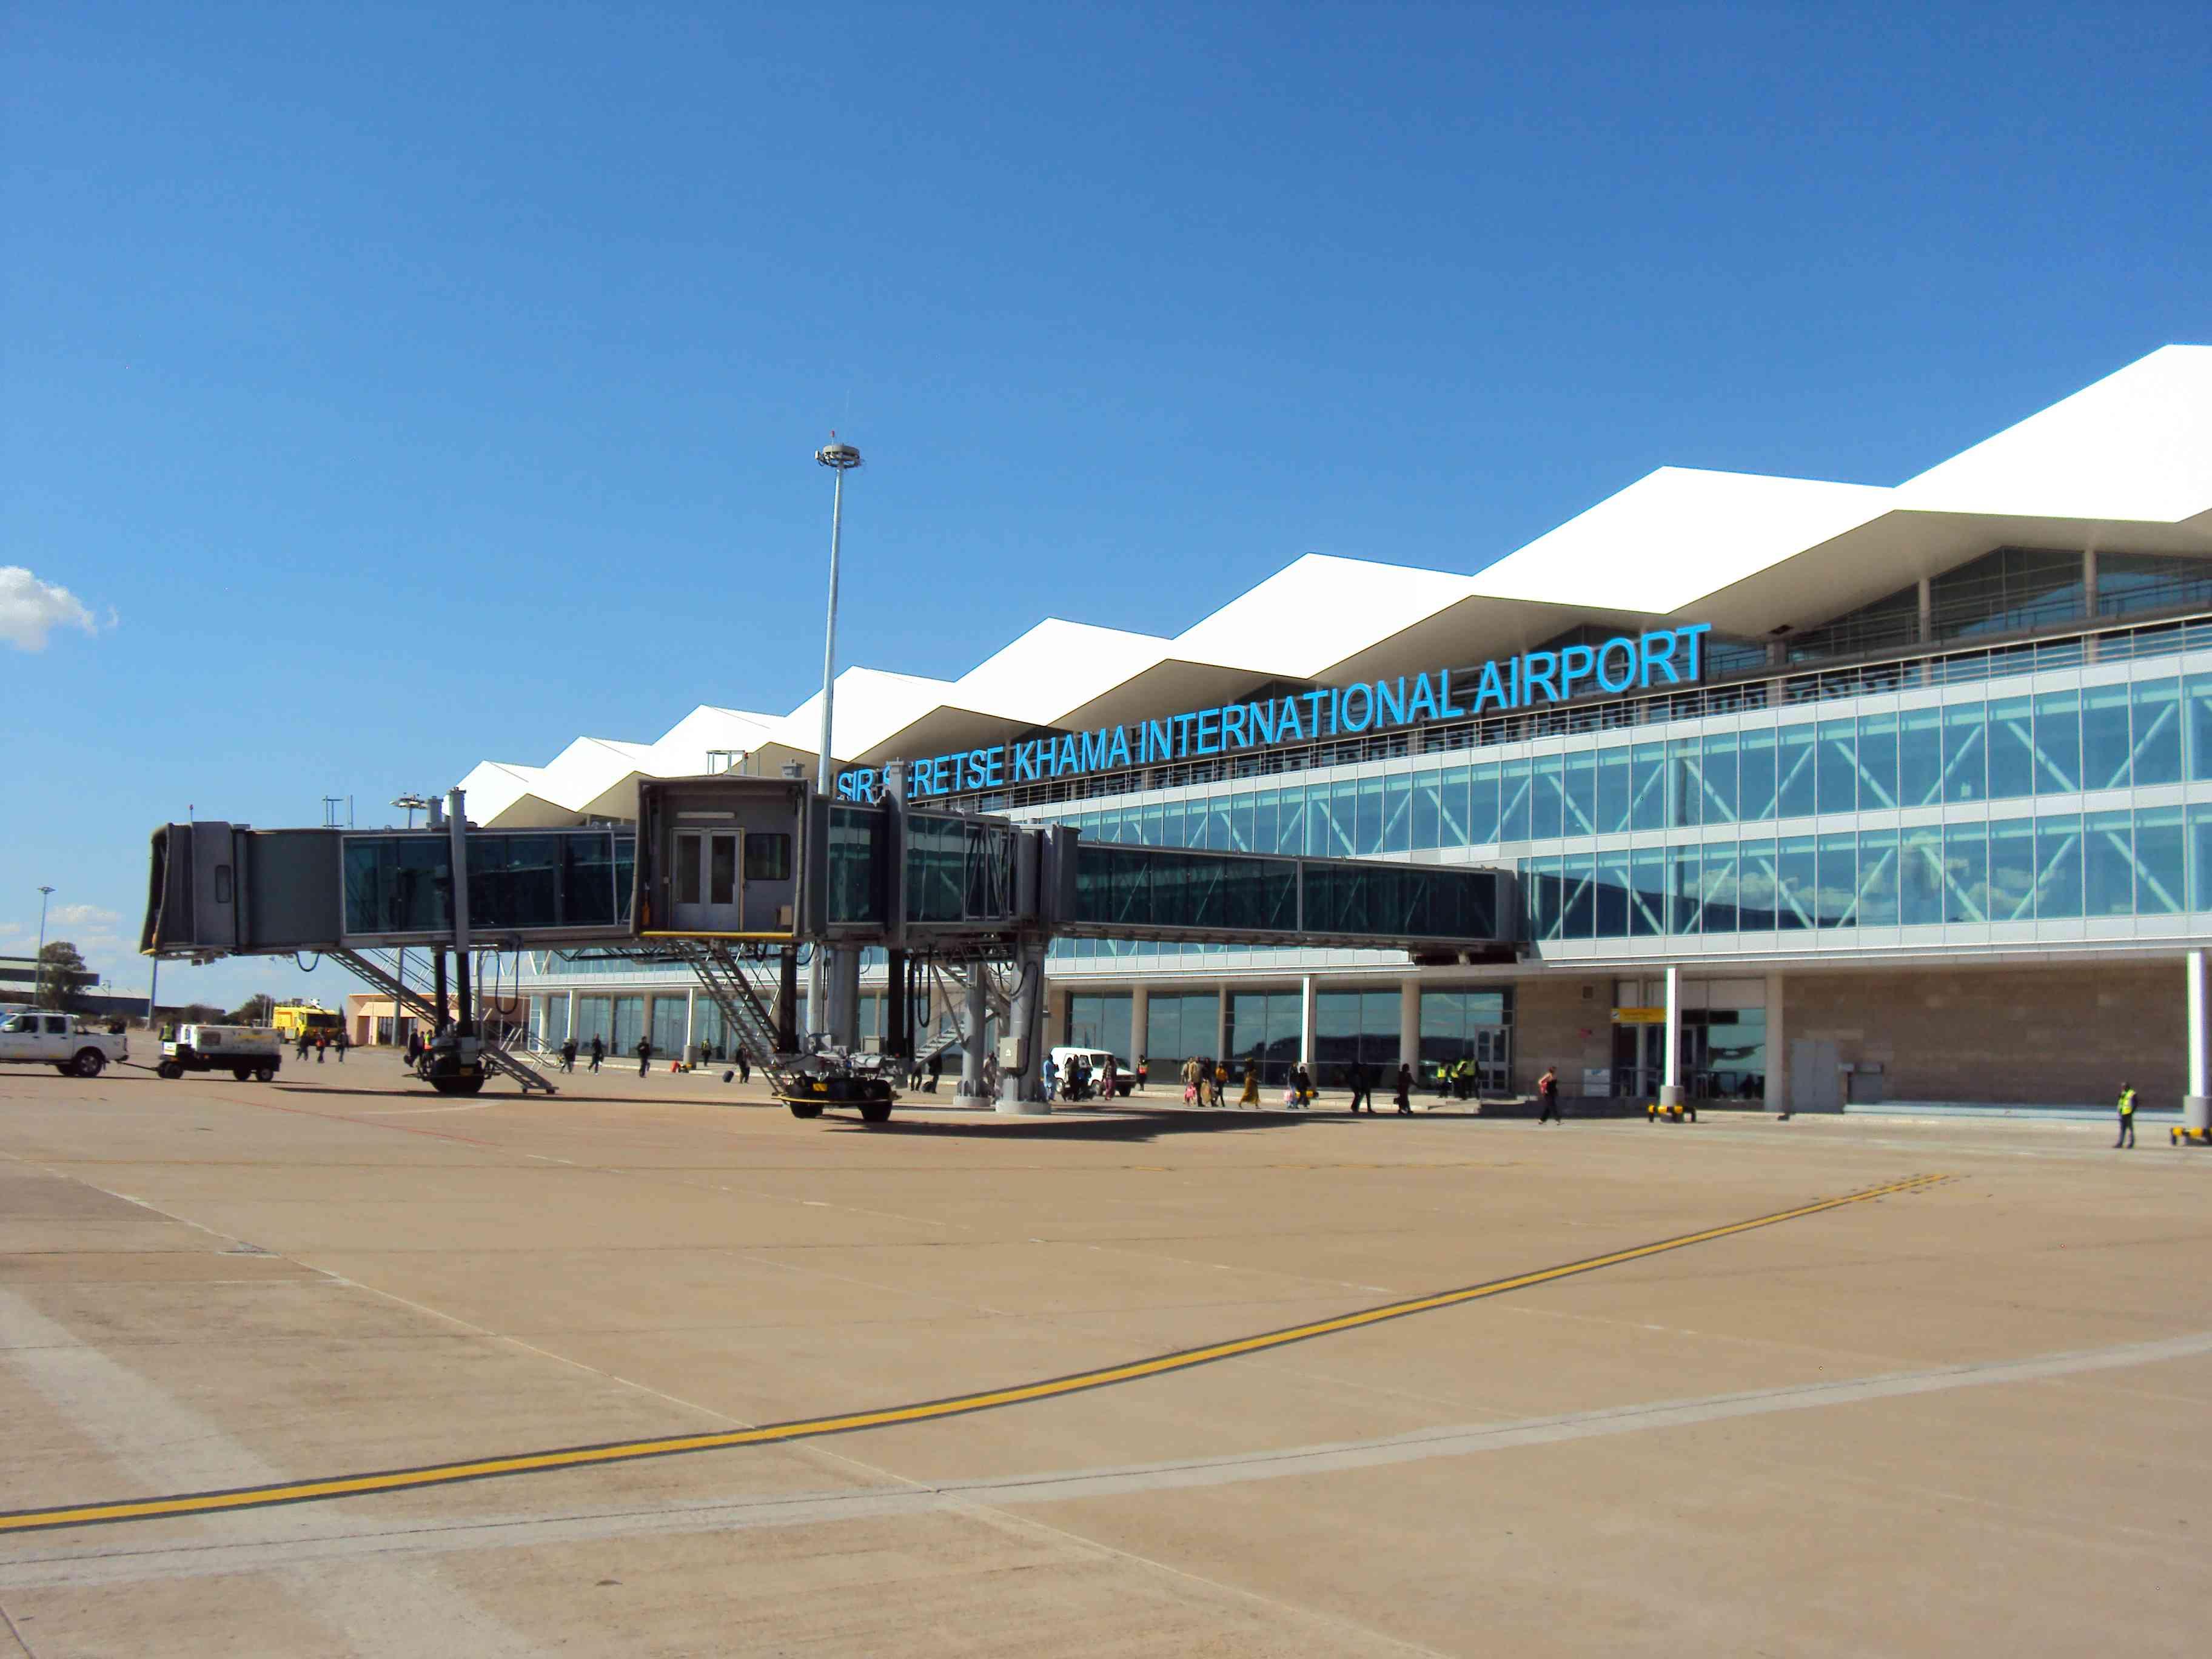 Sir Seretse Khama International Airport